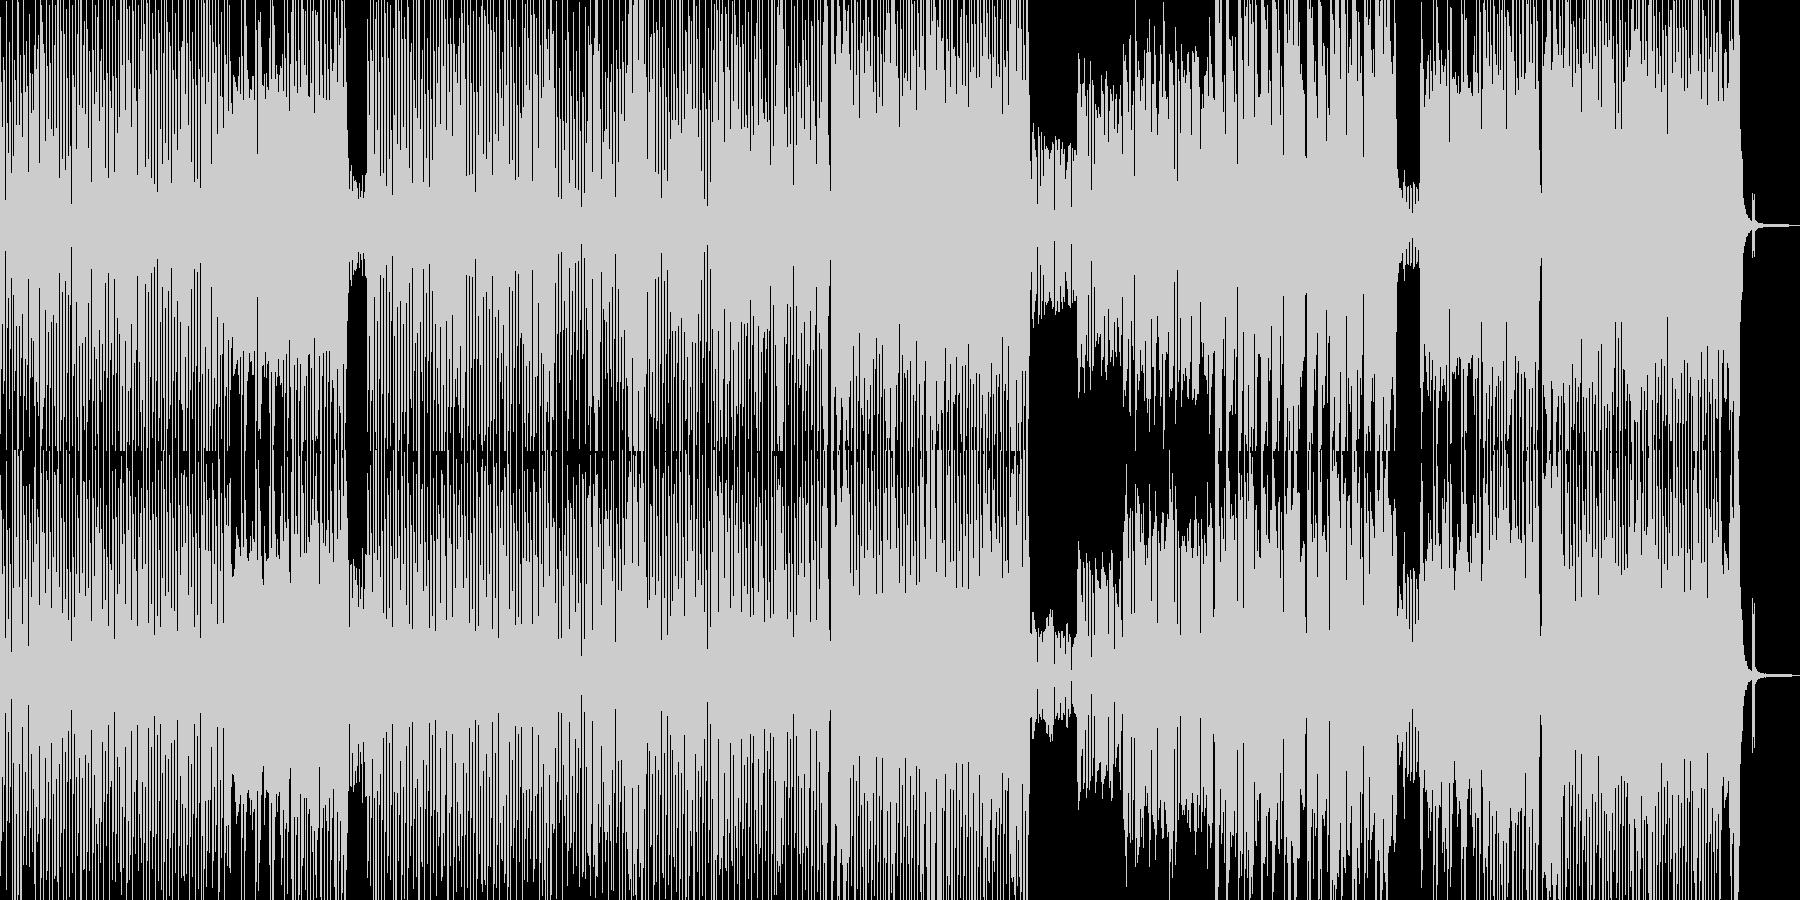 ○oお菓子の国・パステル調ポップo○の未再生の波形